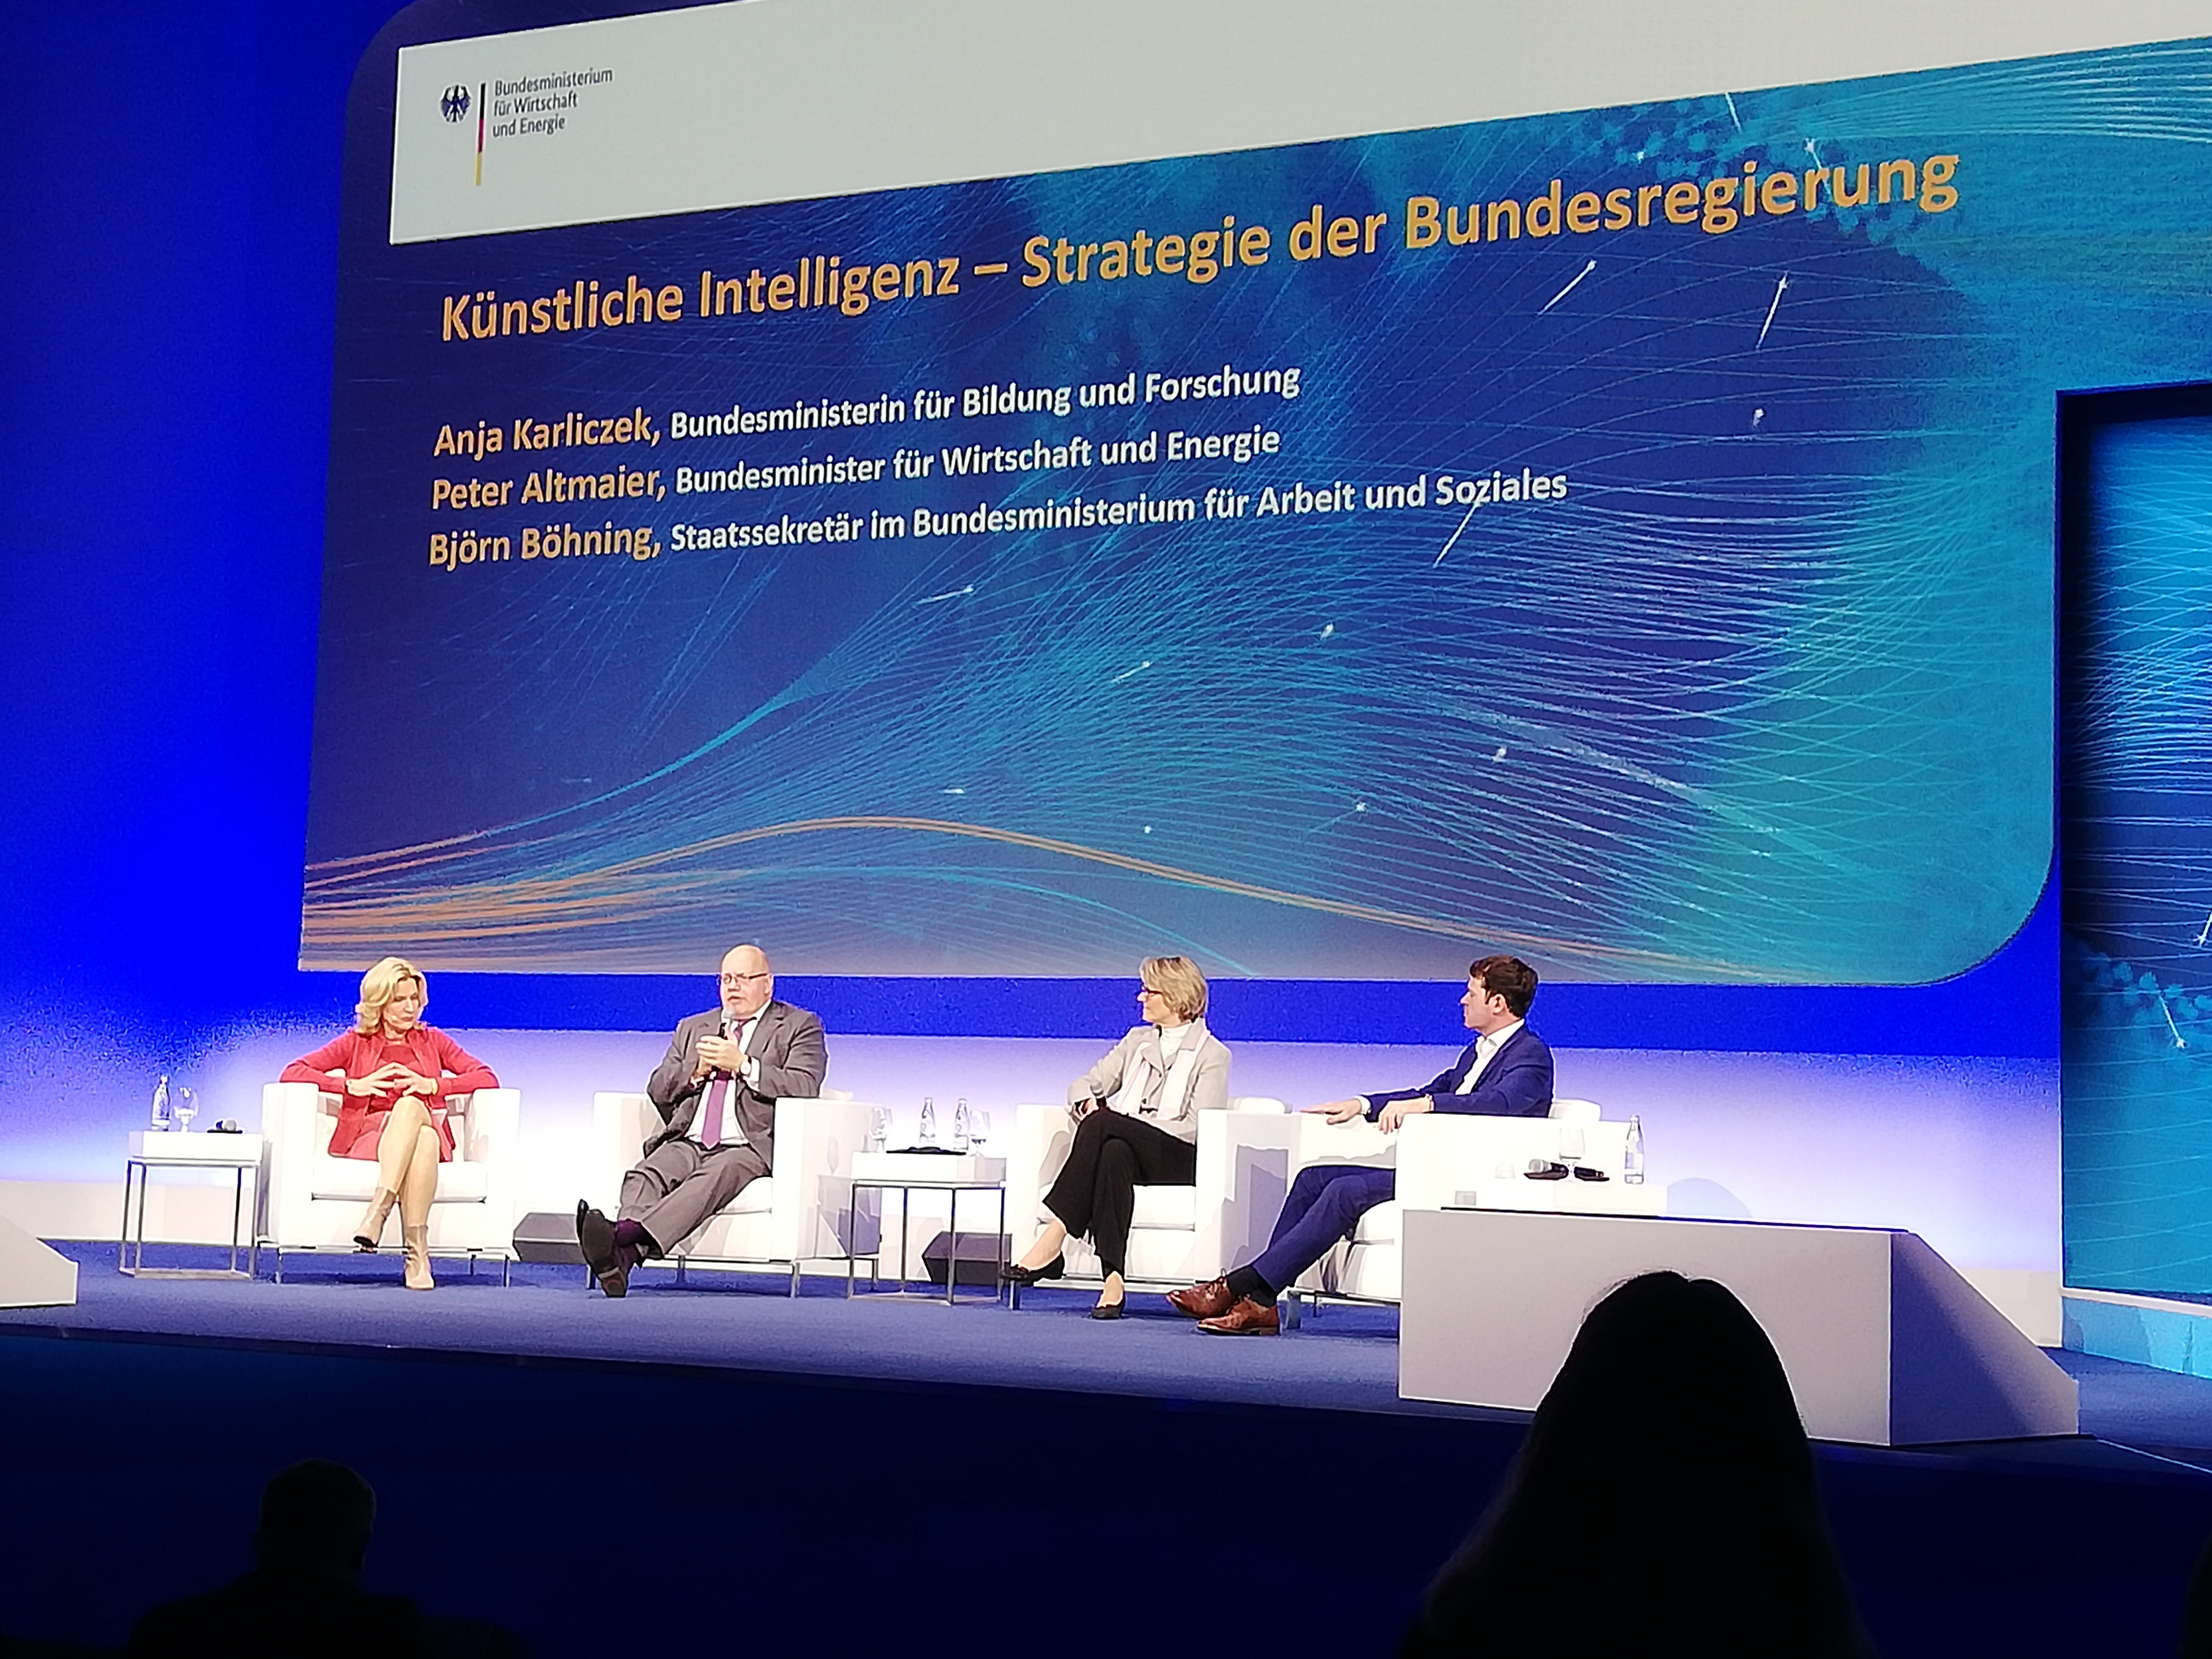 Digital Gipfel 2018 in Nürnberg © Wirtschaftsförderung Nürnberg